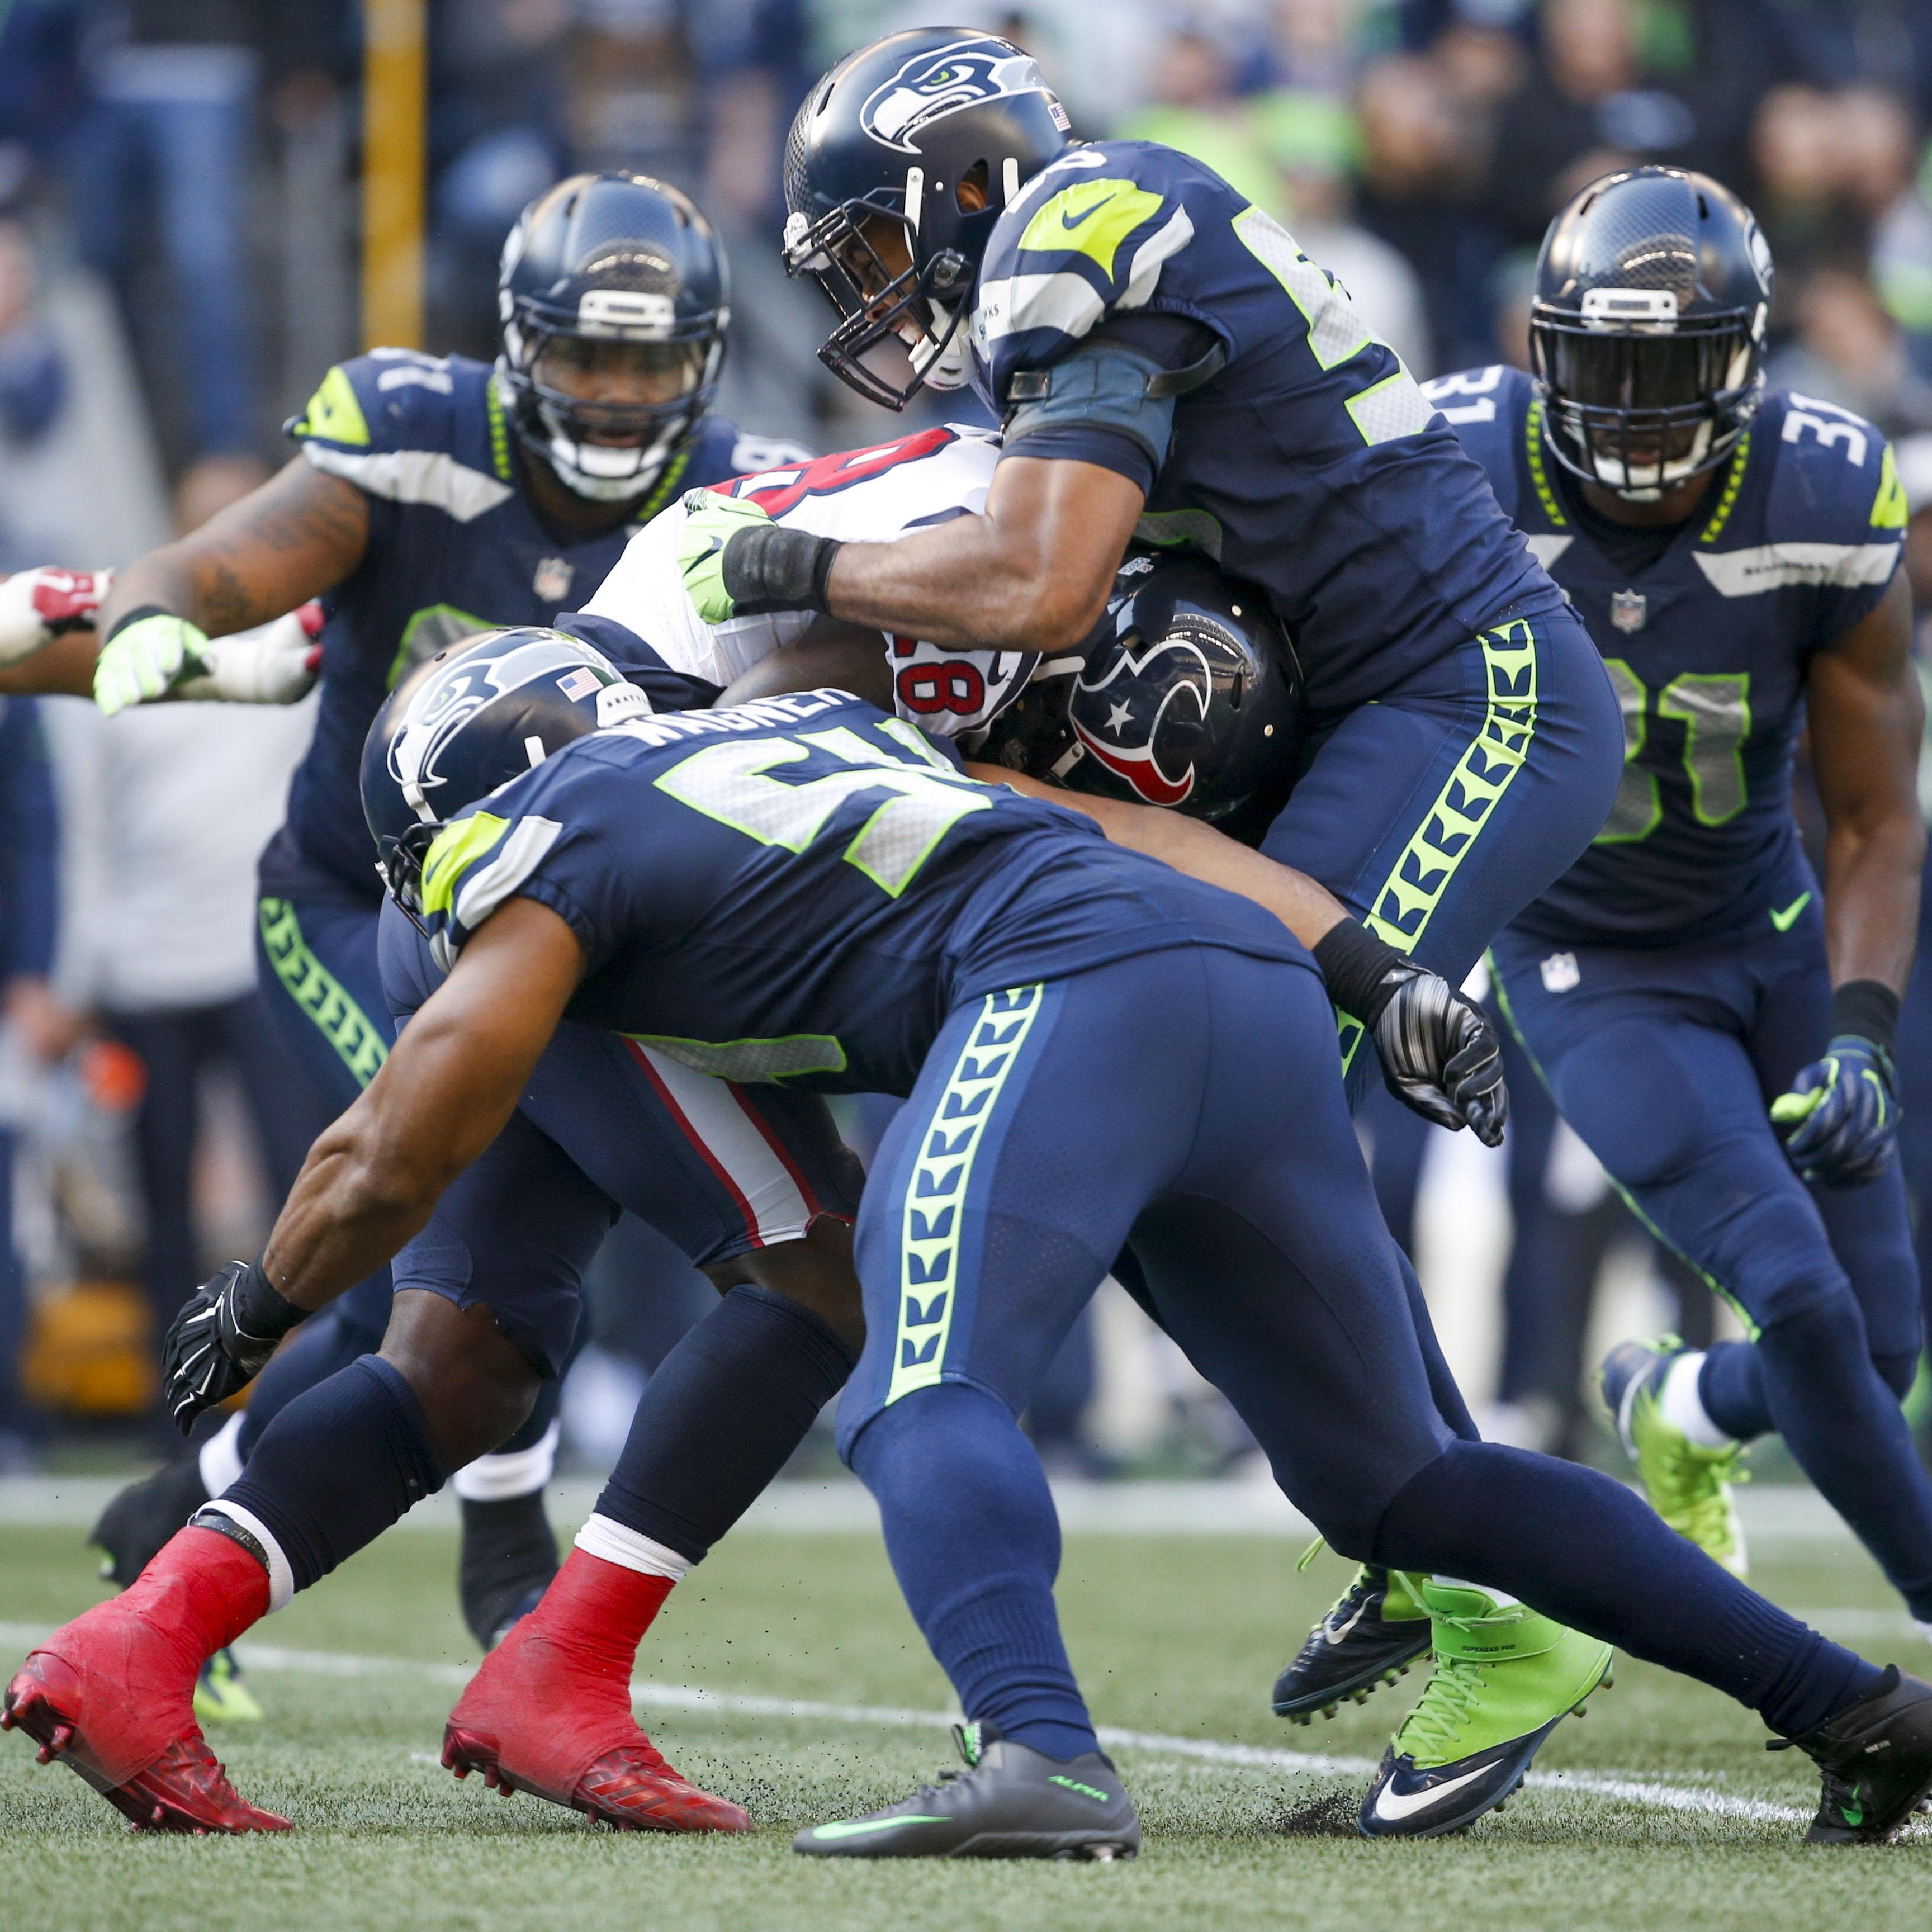 NFL: Houston Texans at Seattle Seahawks